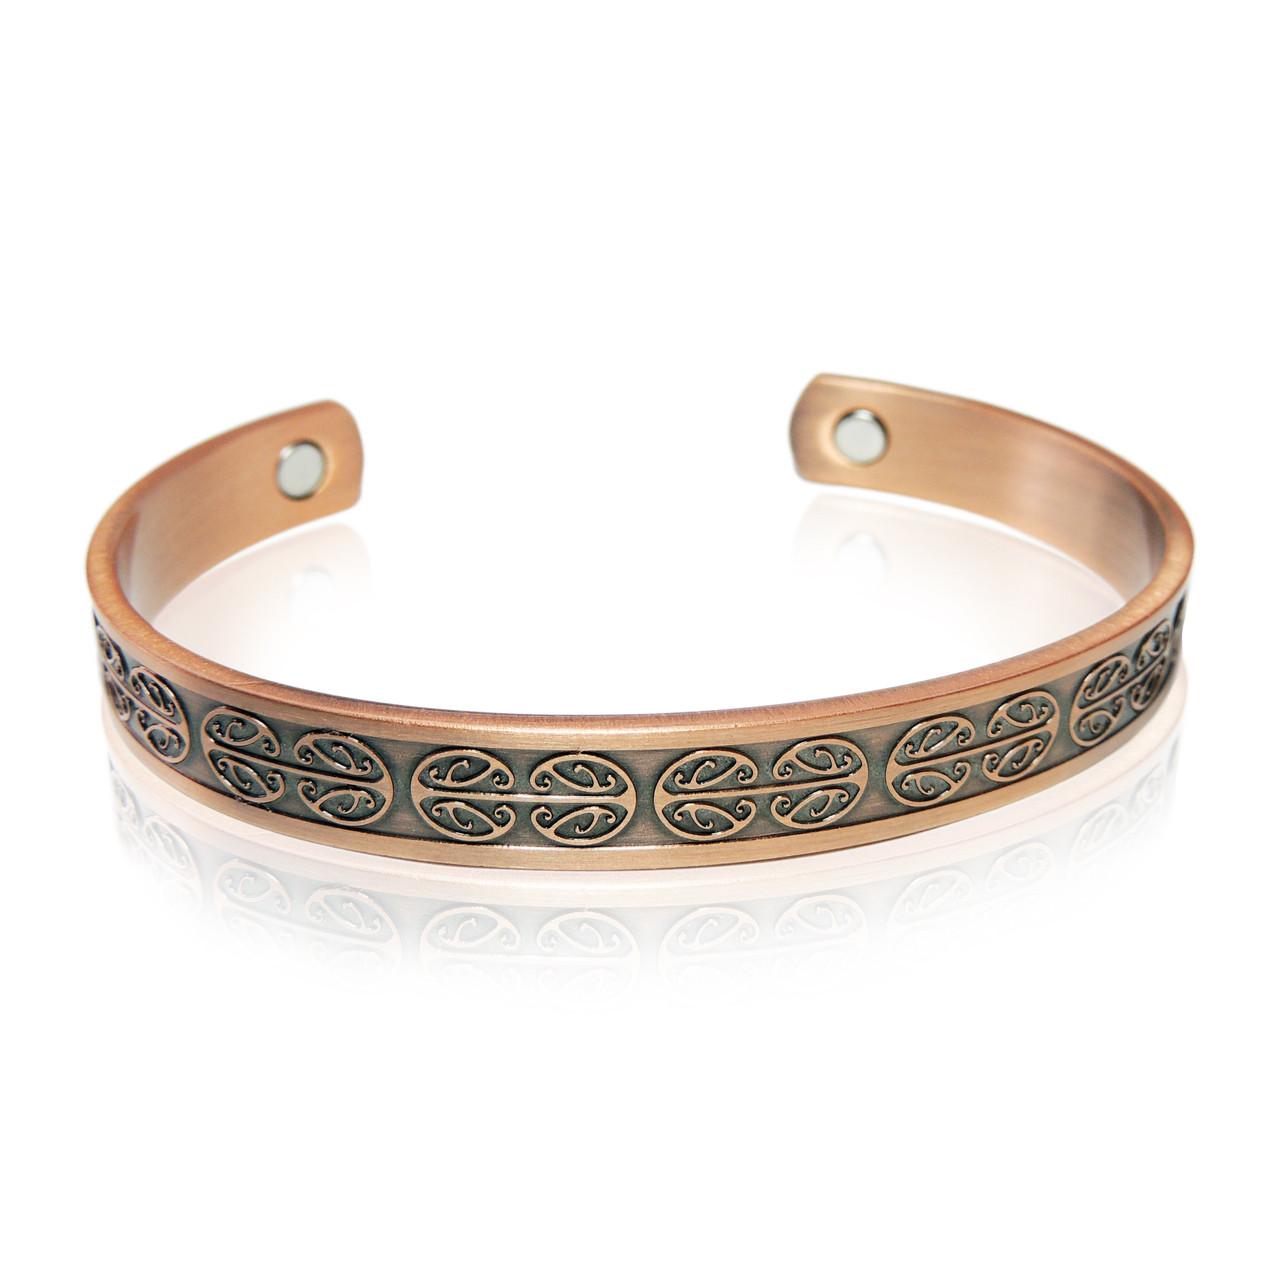 C-KCB023 Copper Bracelet